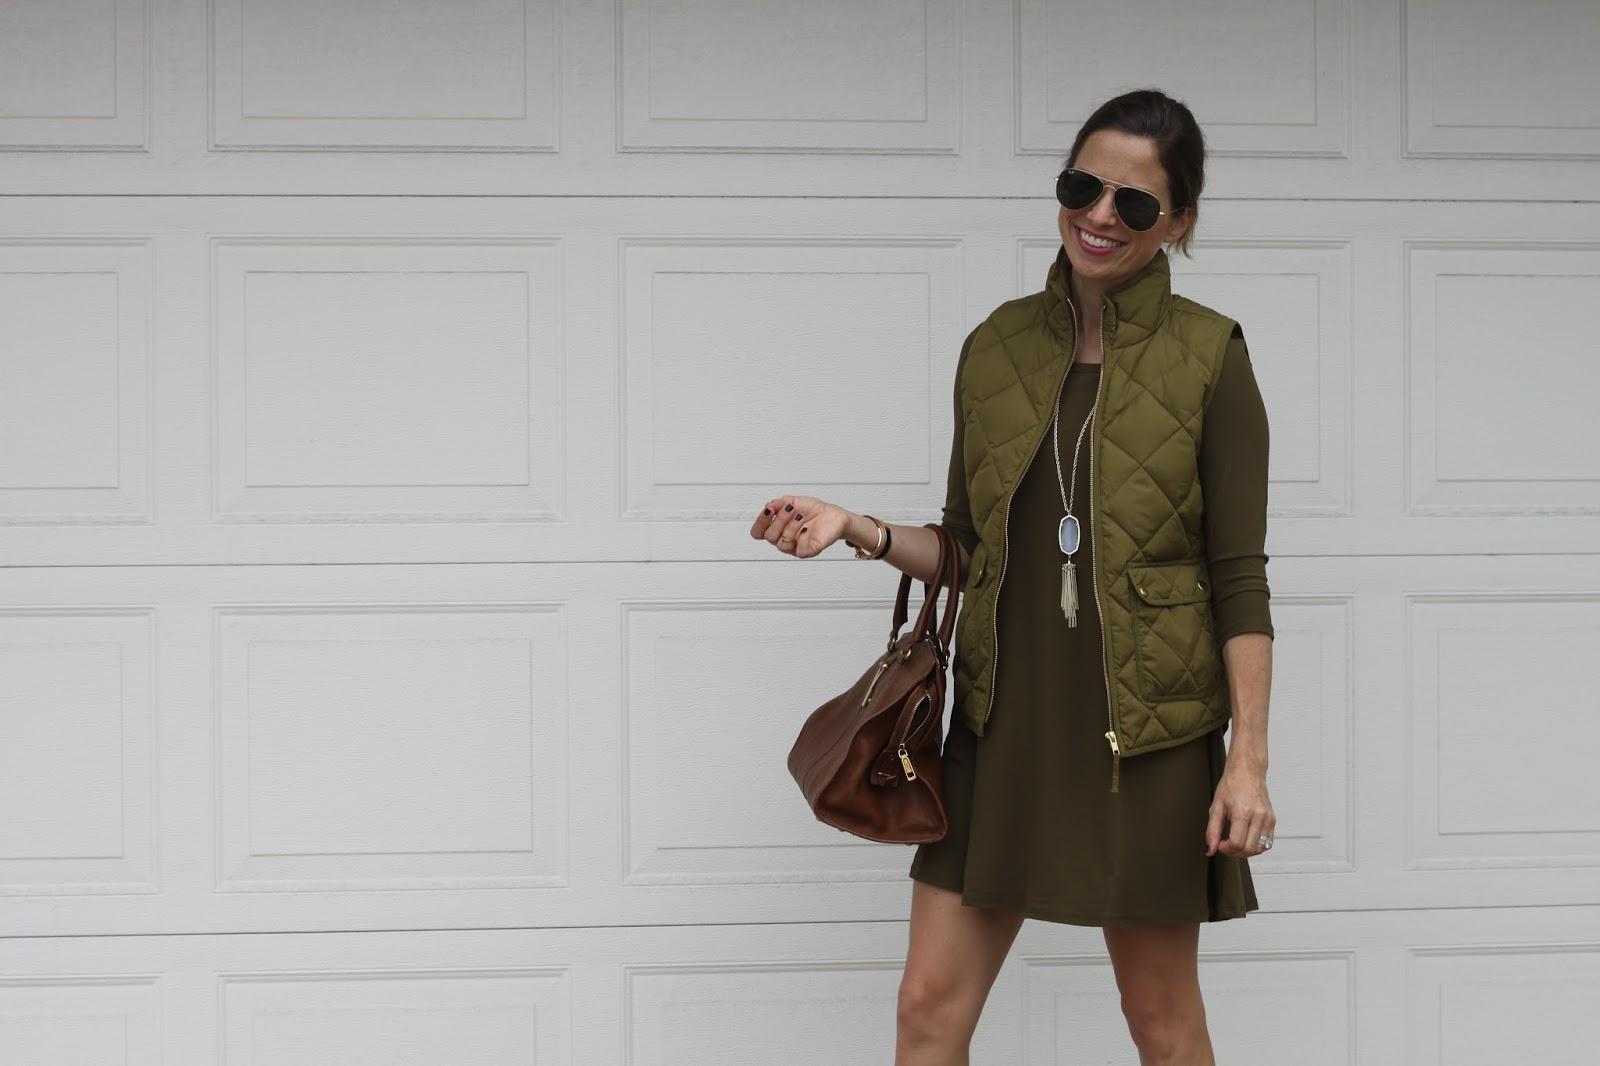 olive green dress and vest